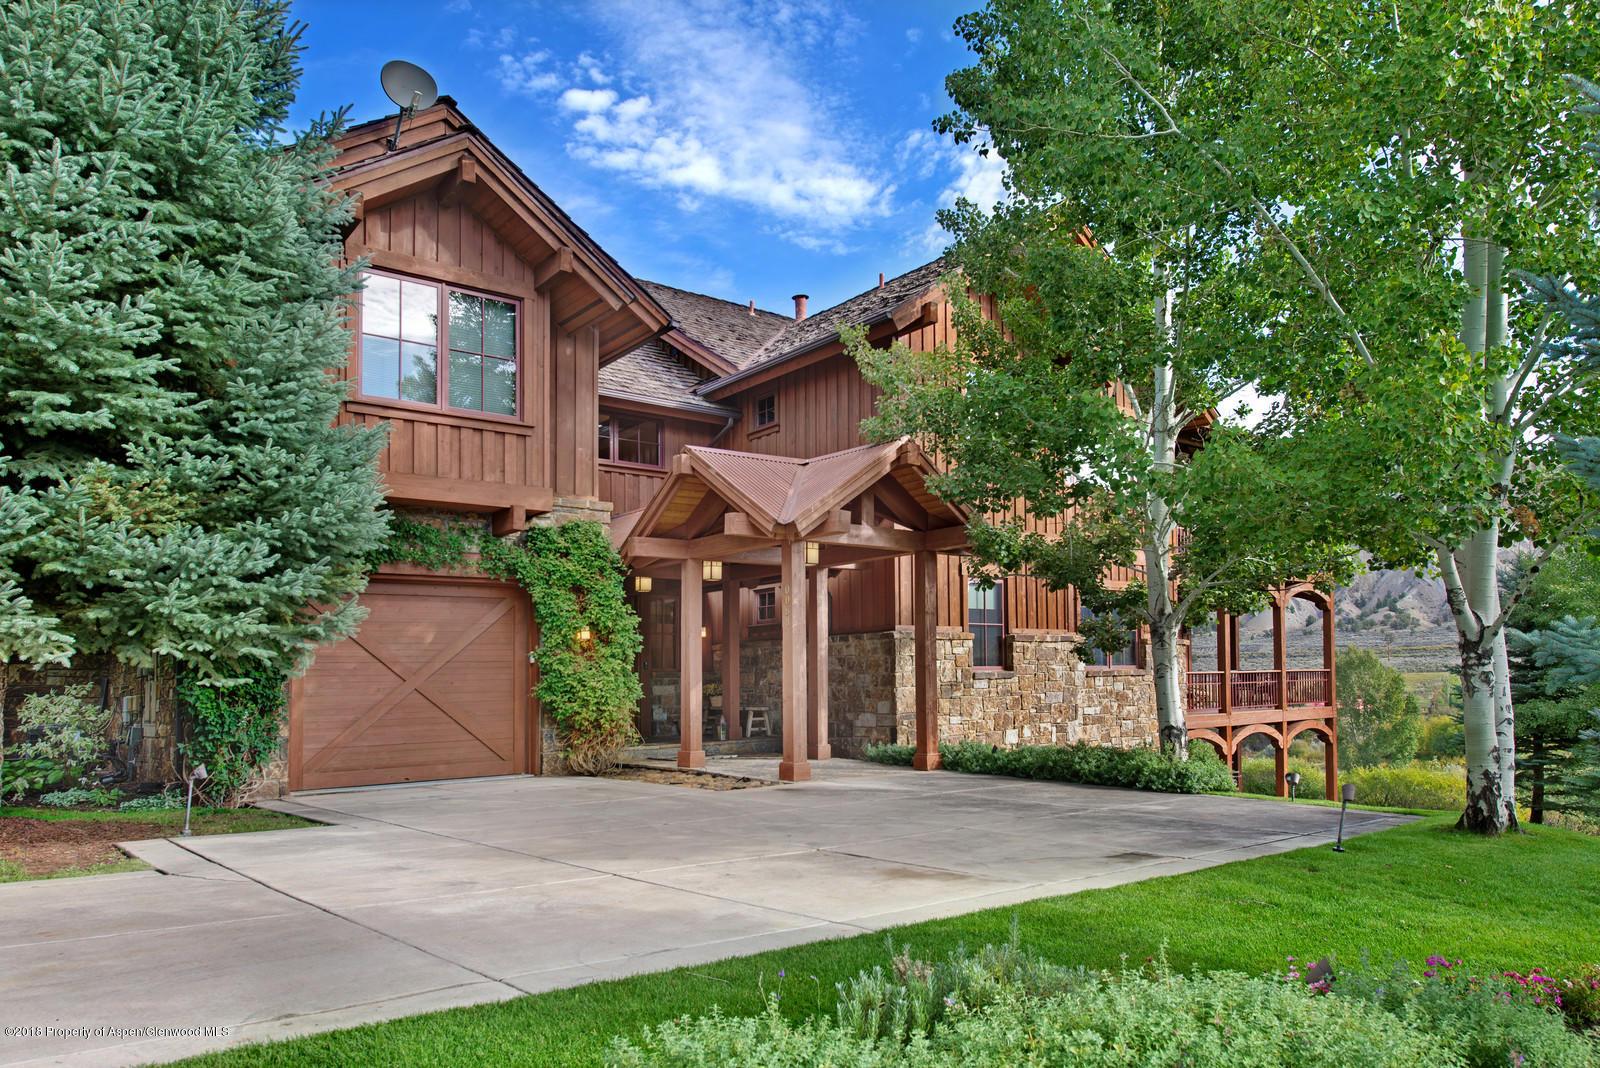 68 Club Lodge Drive - Carbondale Rural, Colorado